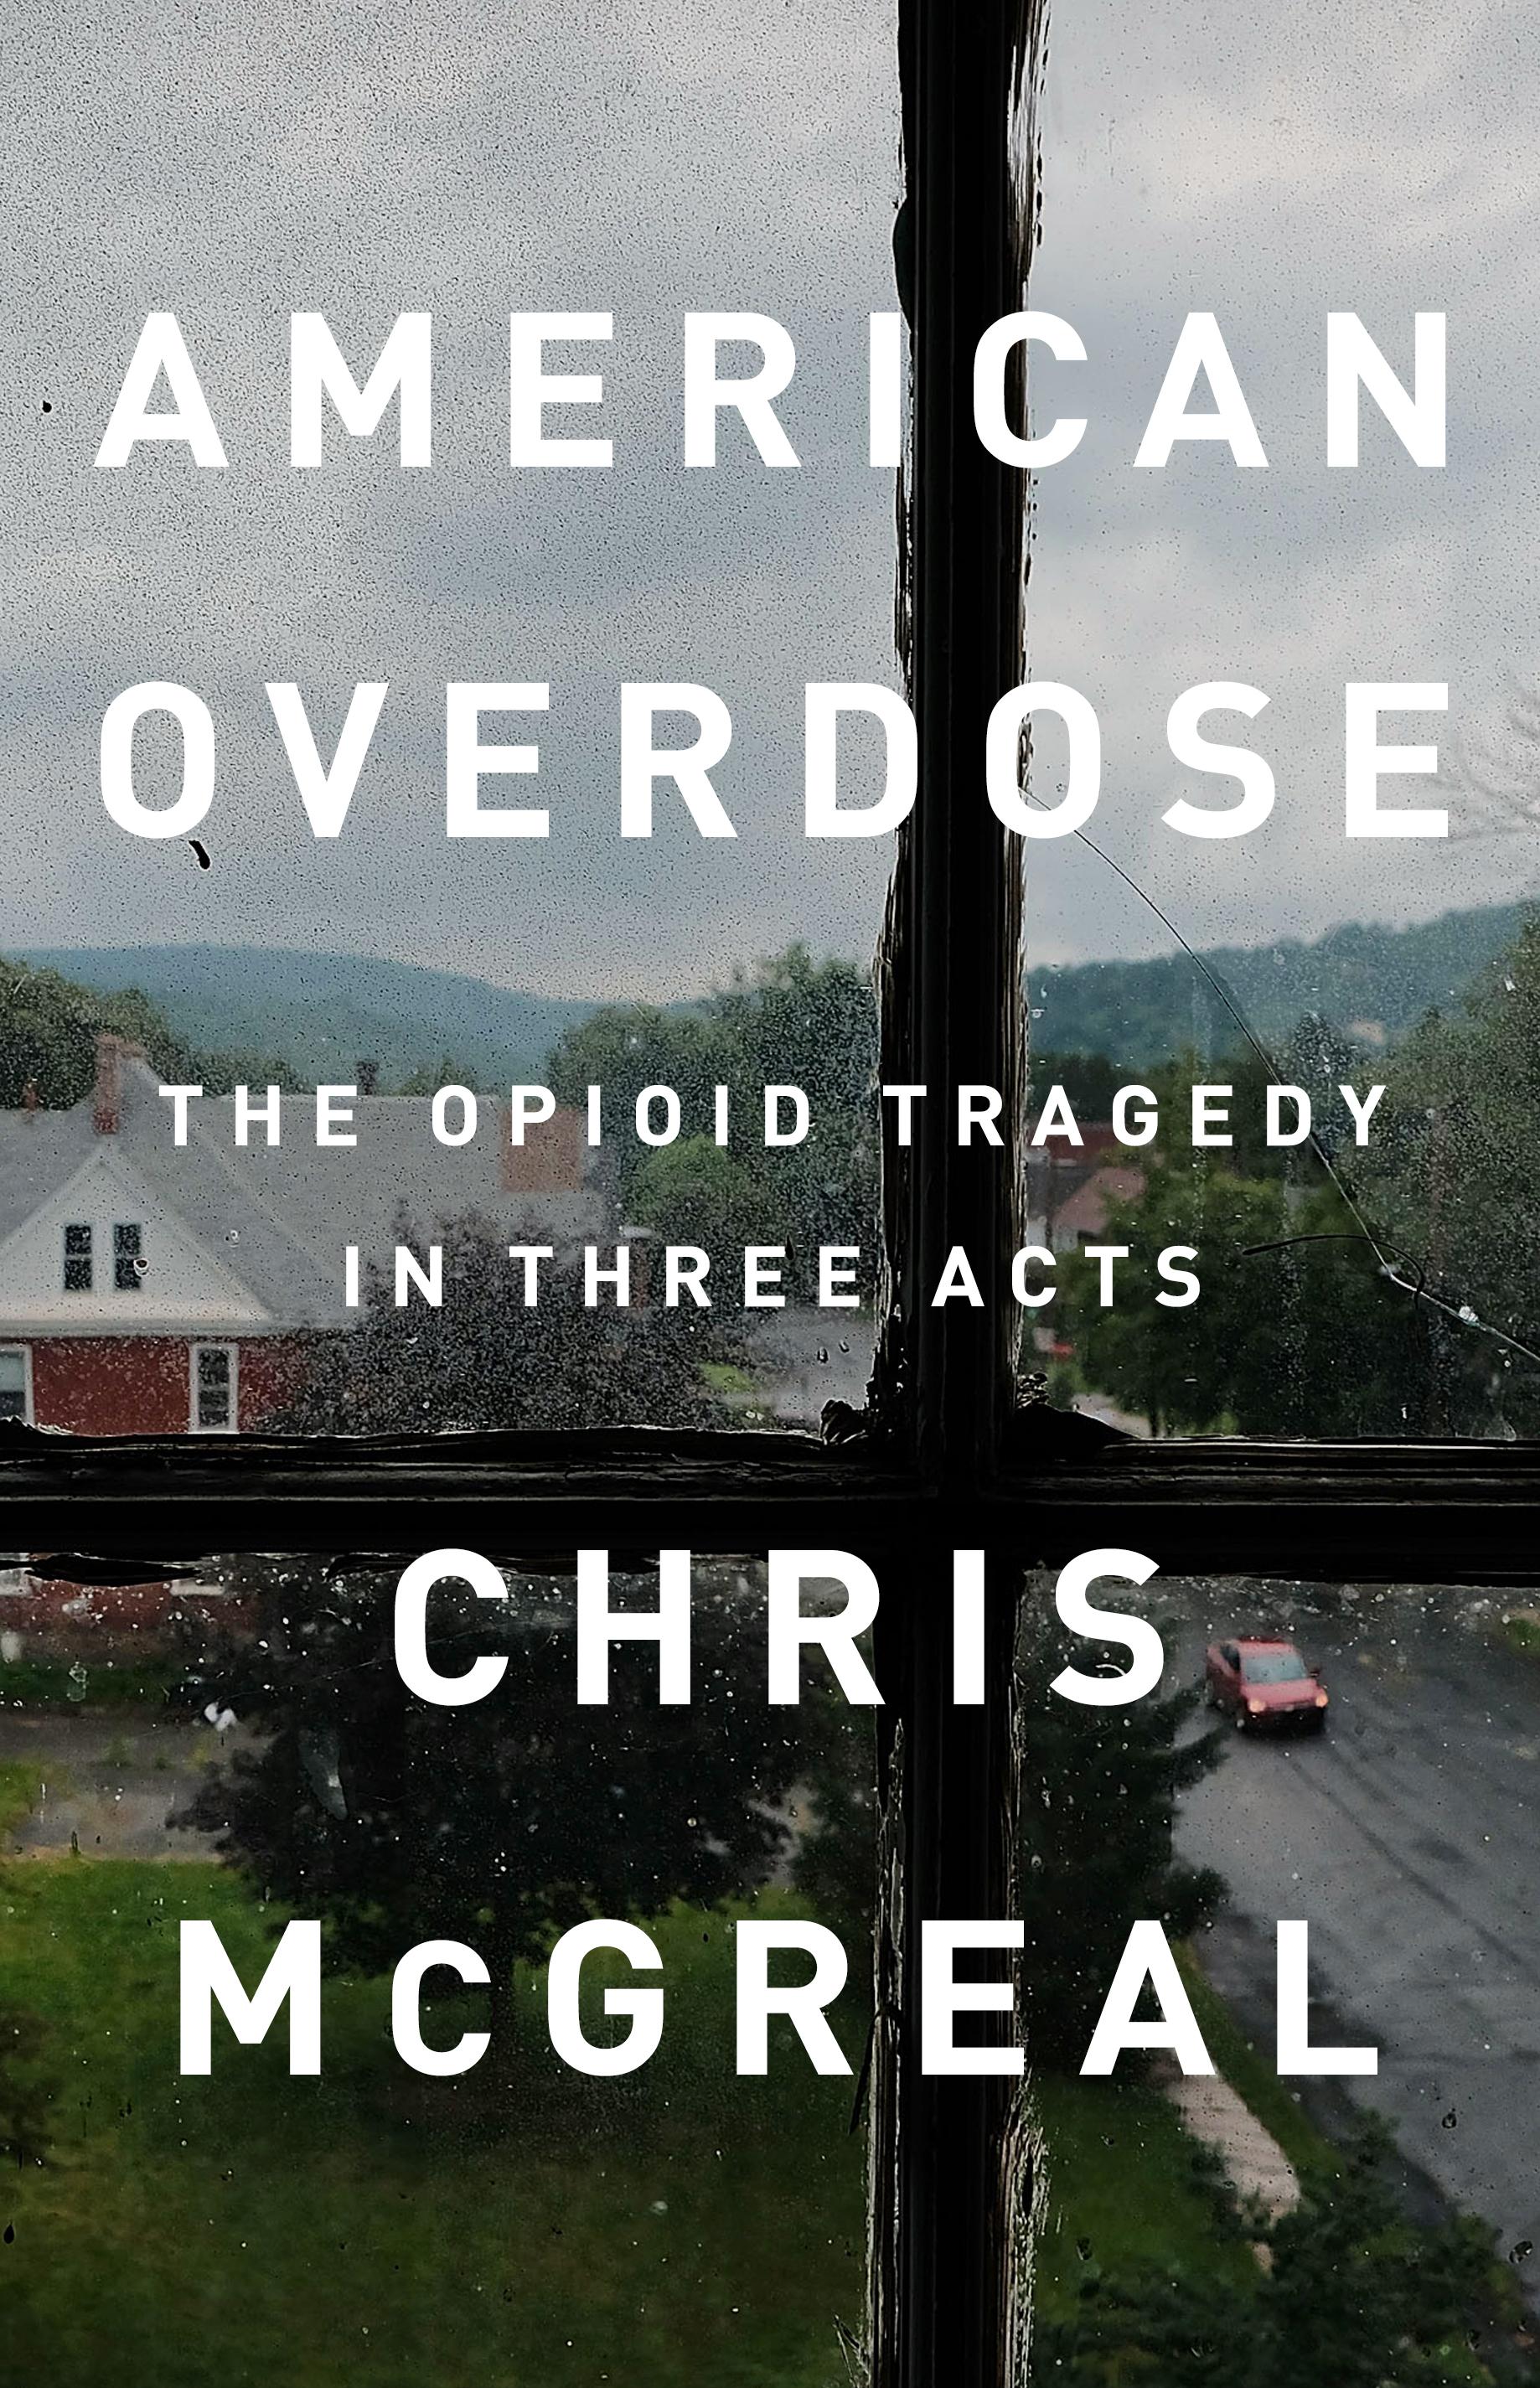 AmericanOverdose_2.jpg